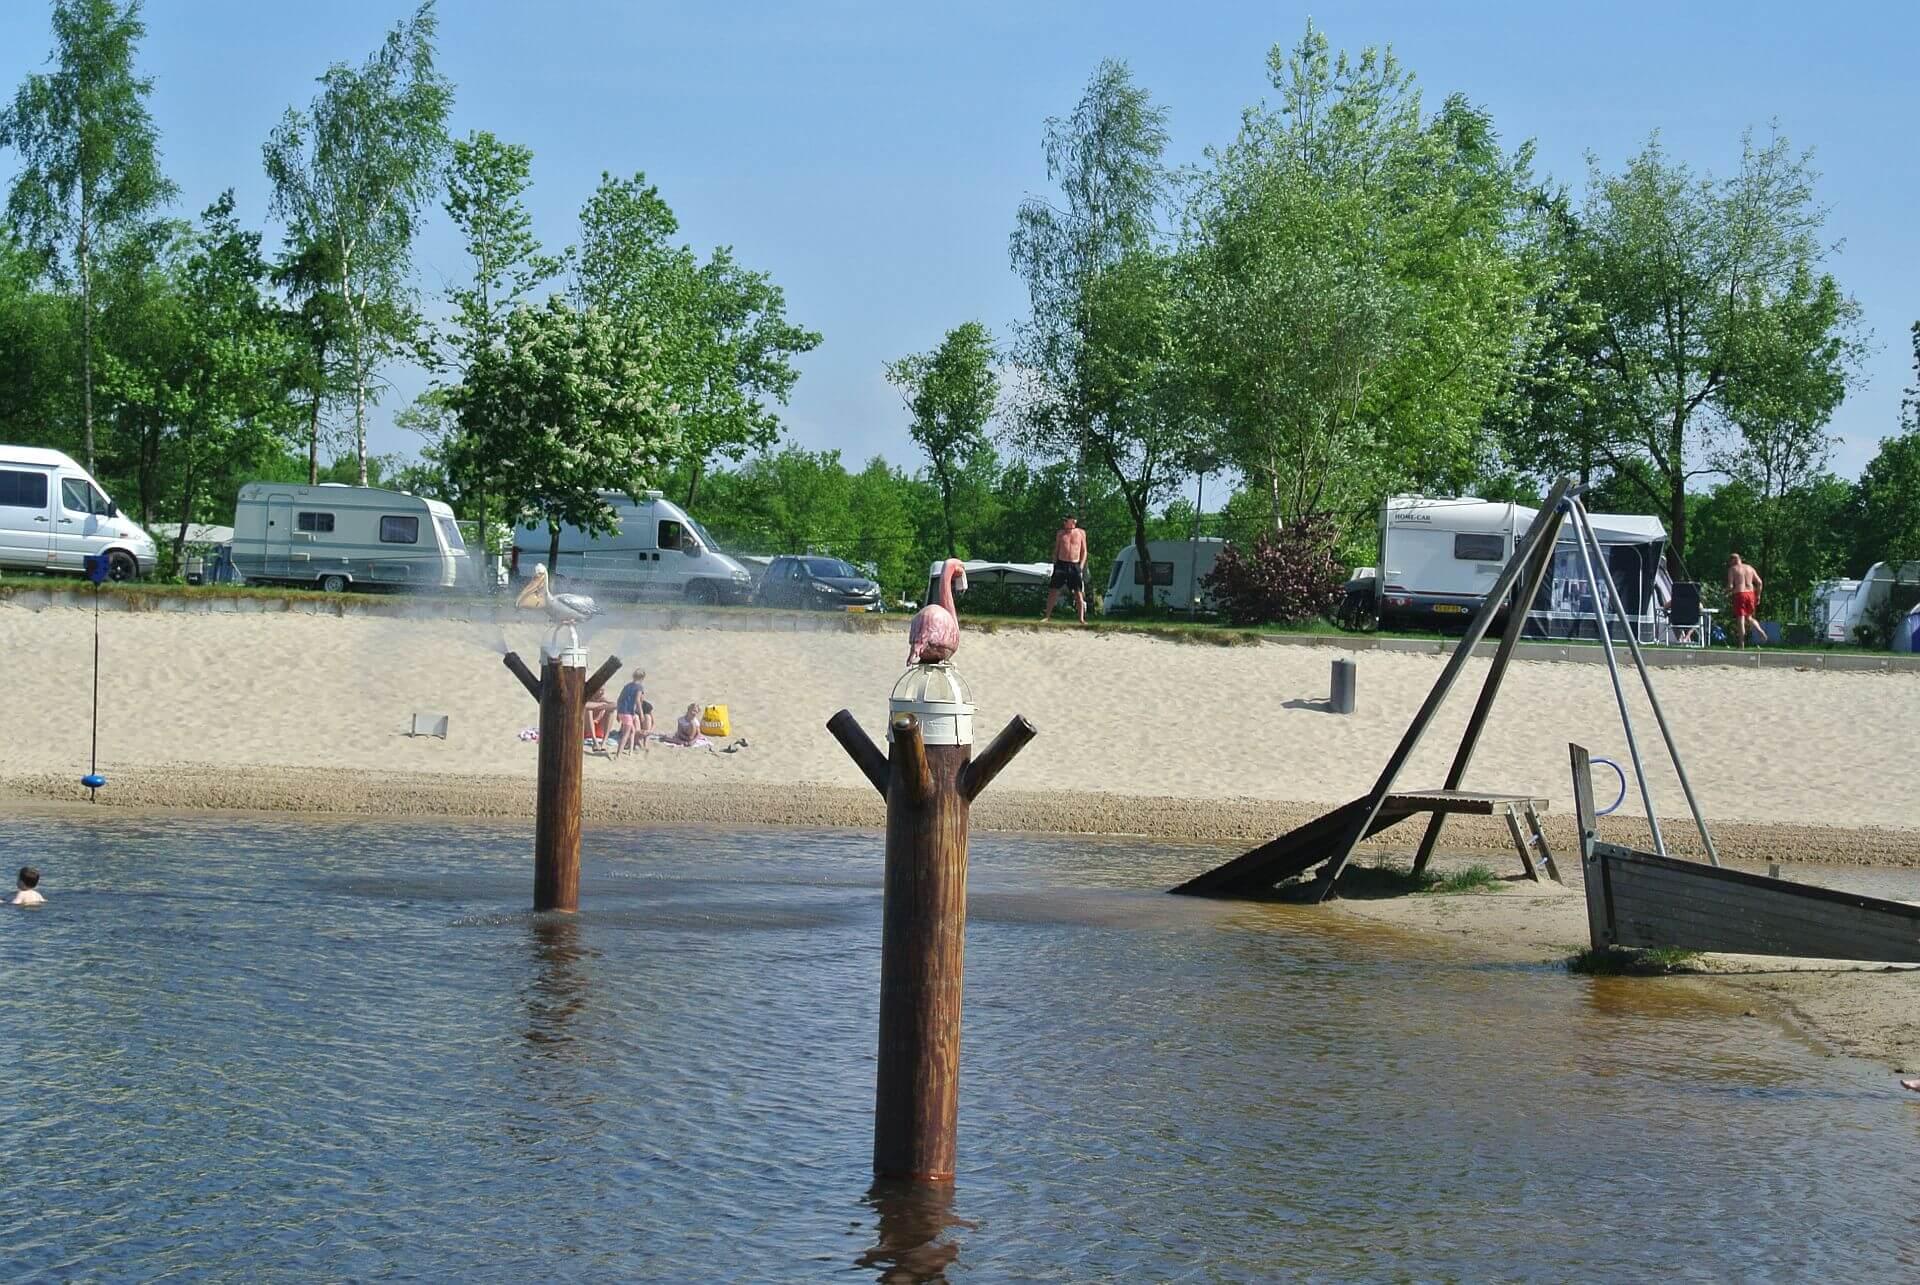 Kampeerclub in Overijssel - kampeerclub in Overijssel